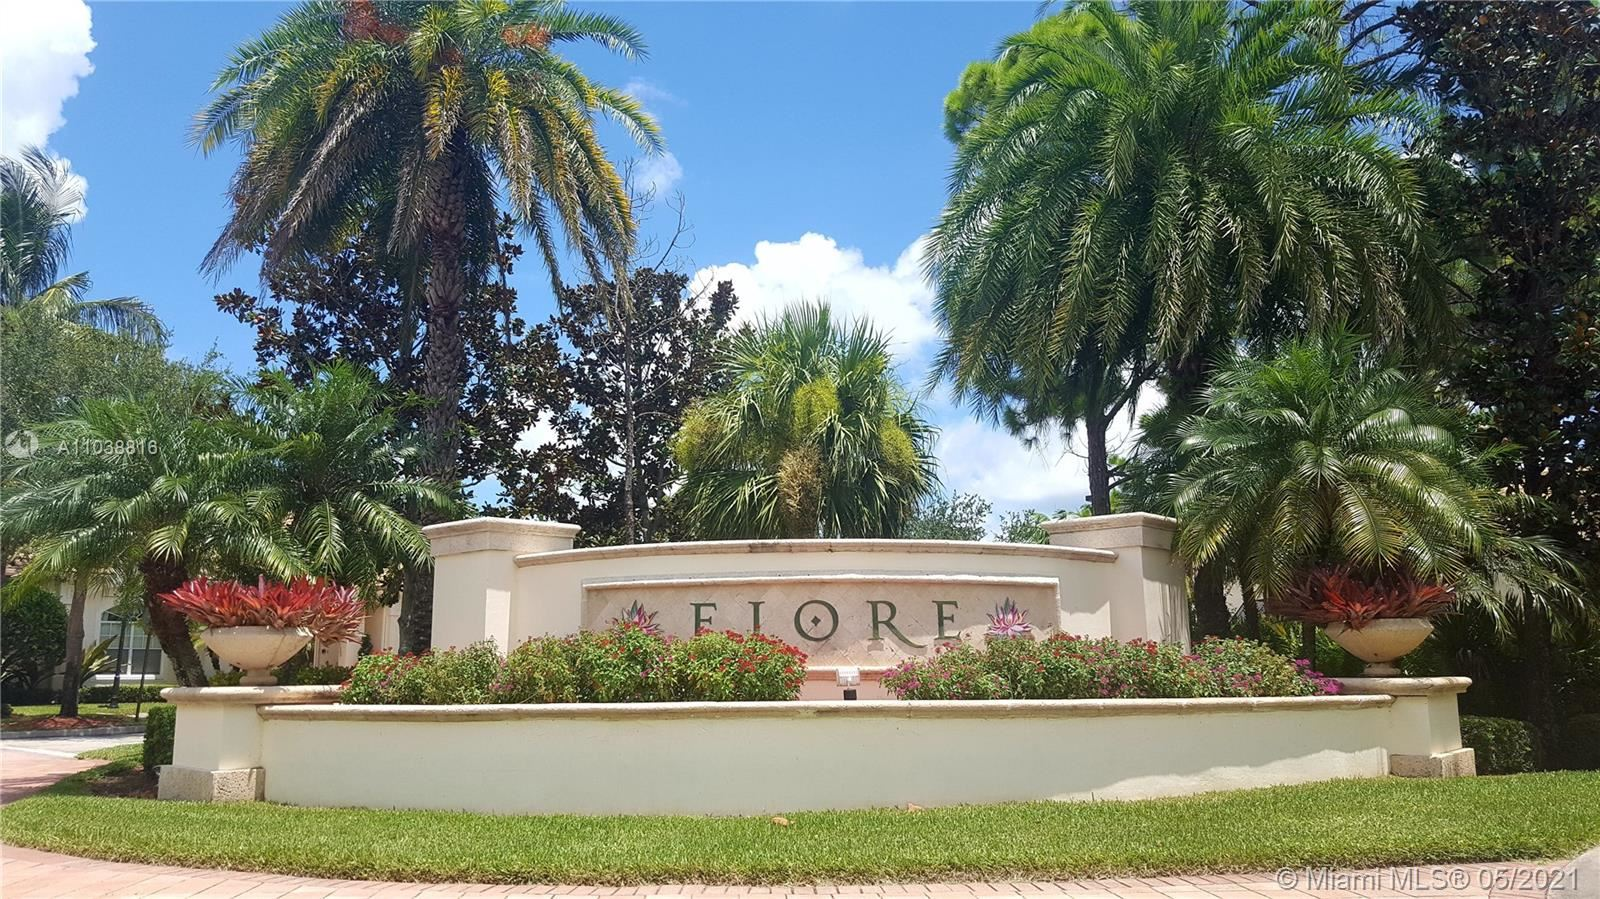 Photo of 8205 W Myrtlewood Cir W #8205, Palm Beach Gardens, FL 33418 (MLS # A11038816)